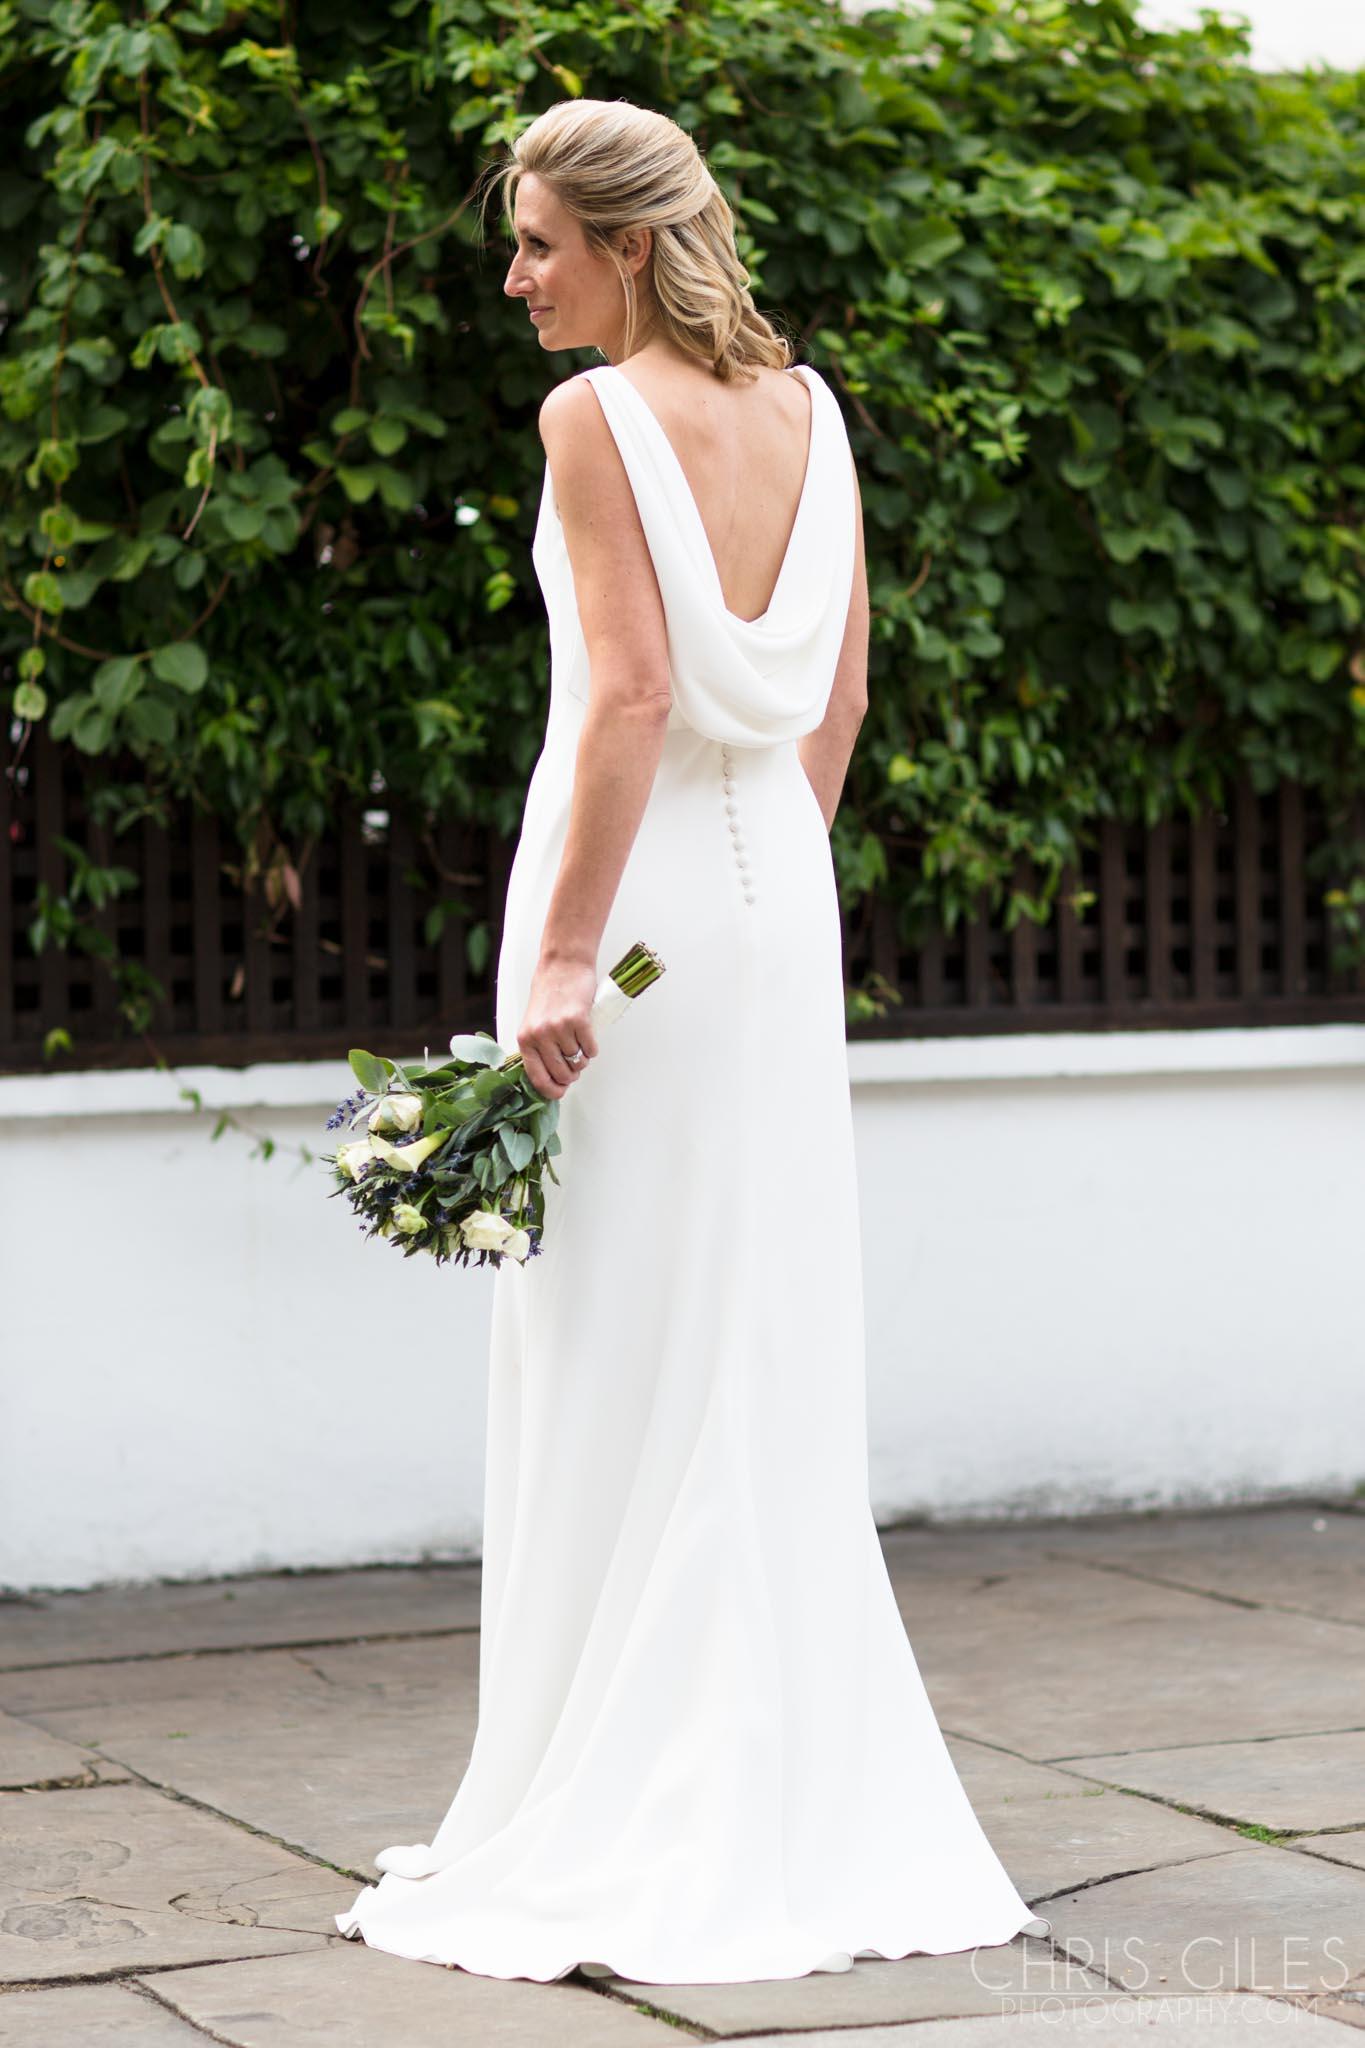 Weddings in Kensington and Chelsea - Chris Giles Photography